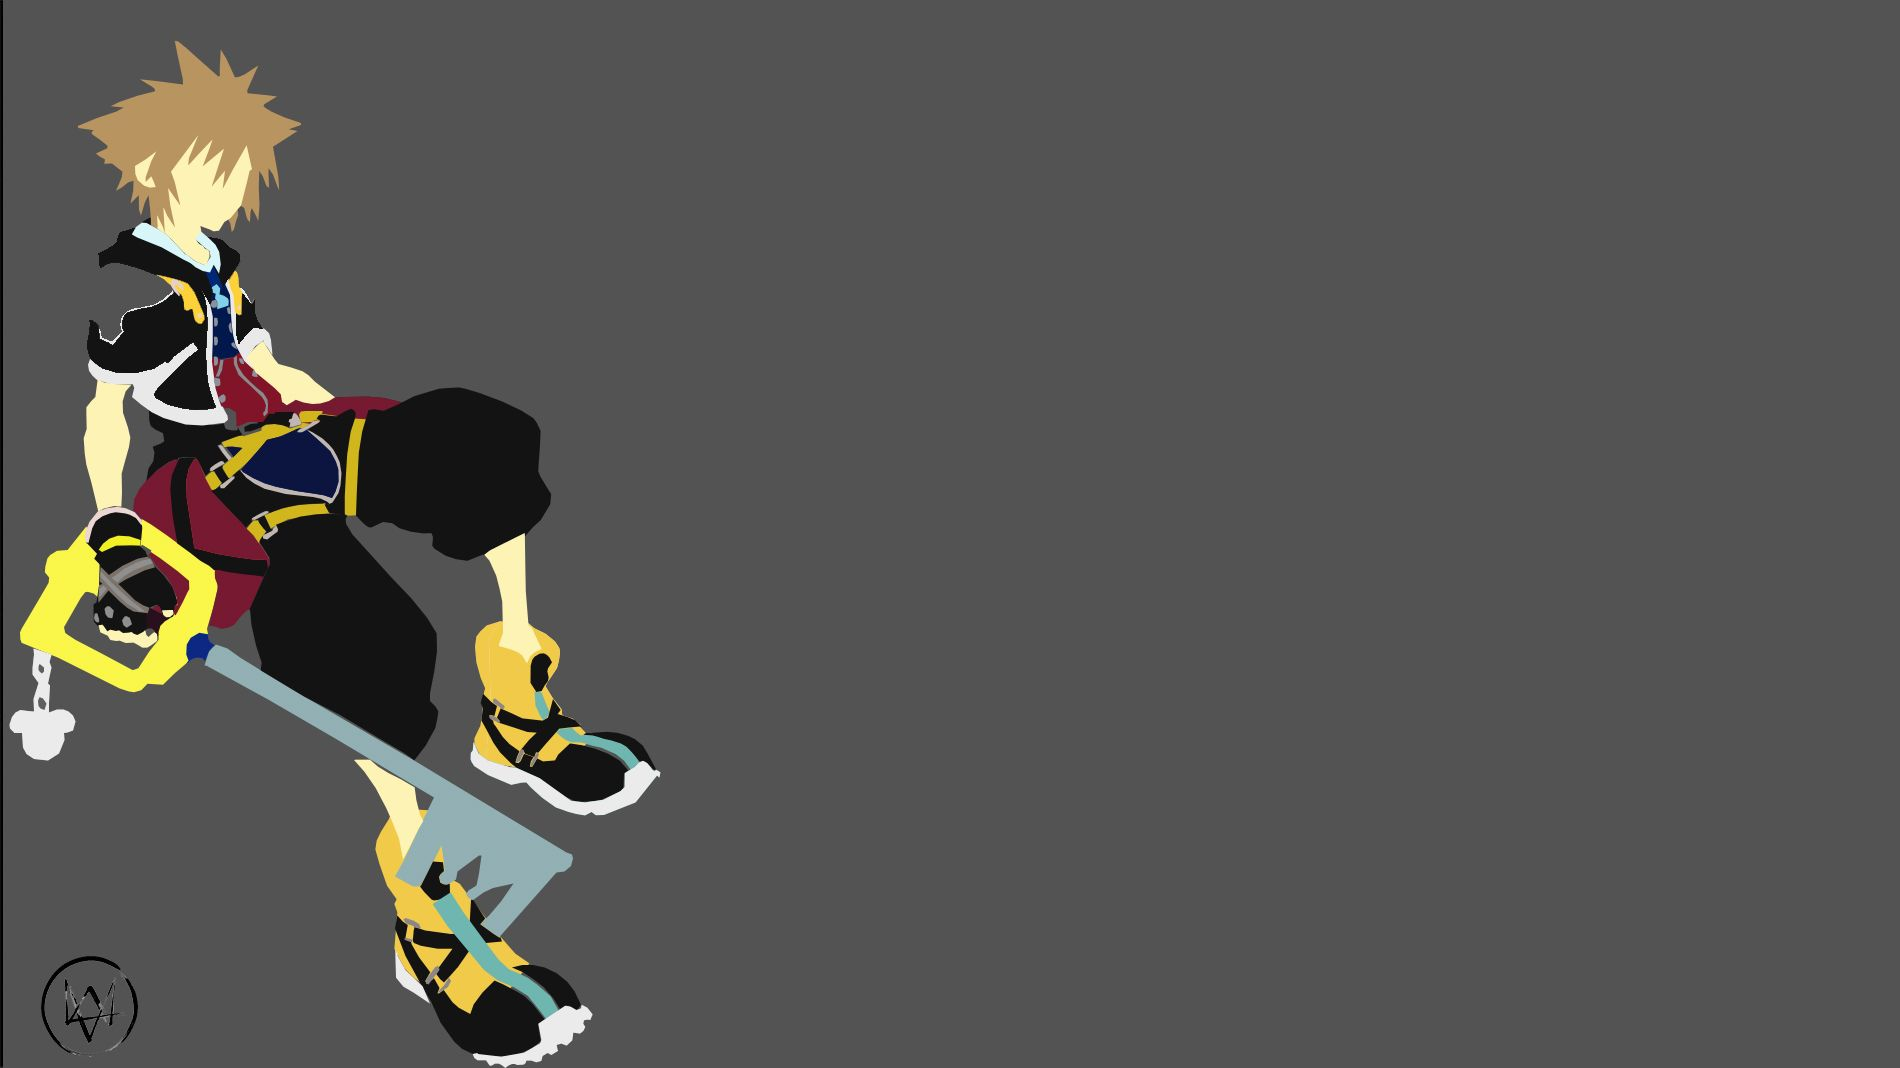 Kingdom Hearts Sora Wallpapers Desktop Background Sora Kingdom Hearts Kingdom Hearts Desktop Wallpaper